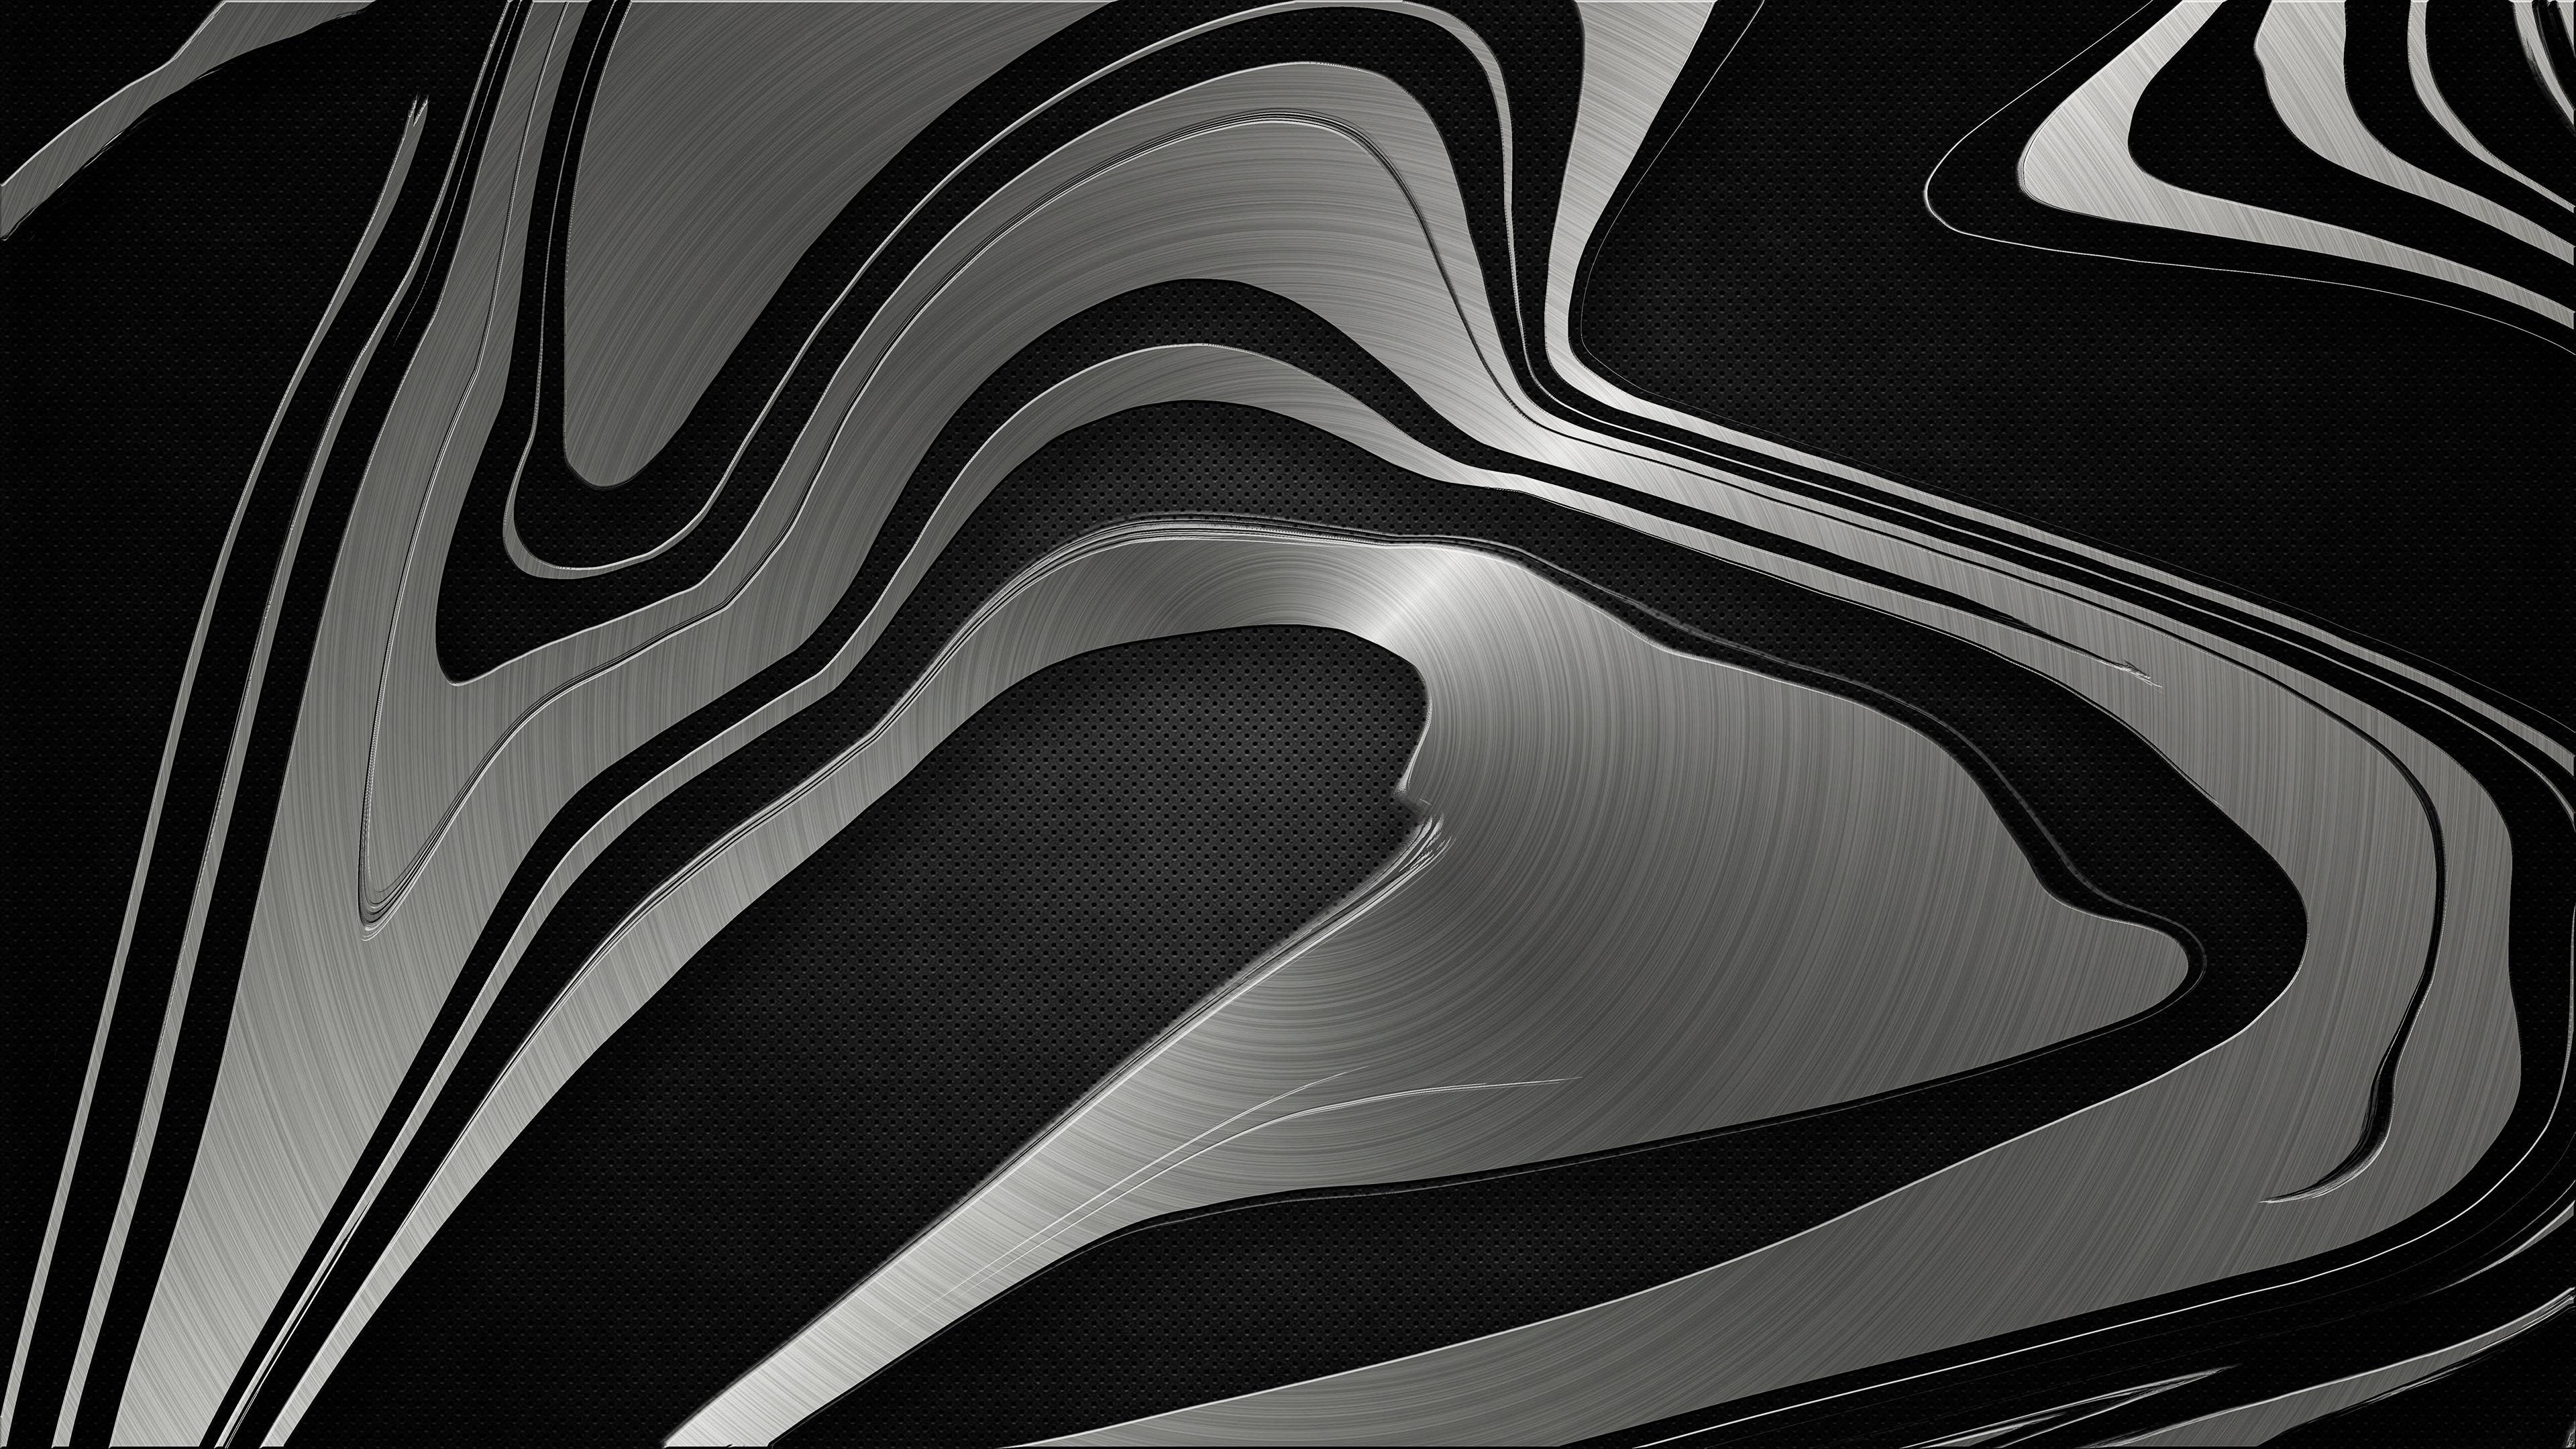 silver metal shine abstract 4k 1603391023 - Silver Metal Shine Abstract 4k - Silver Metal Shine Abstract 4k wallpapers